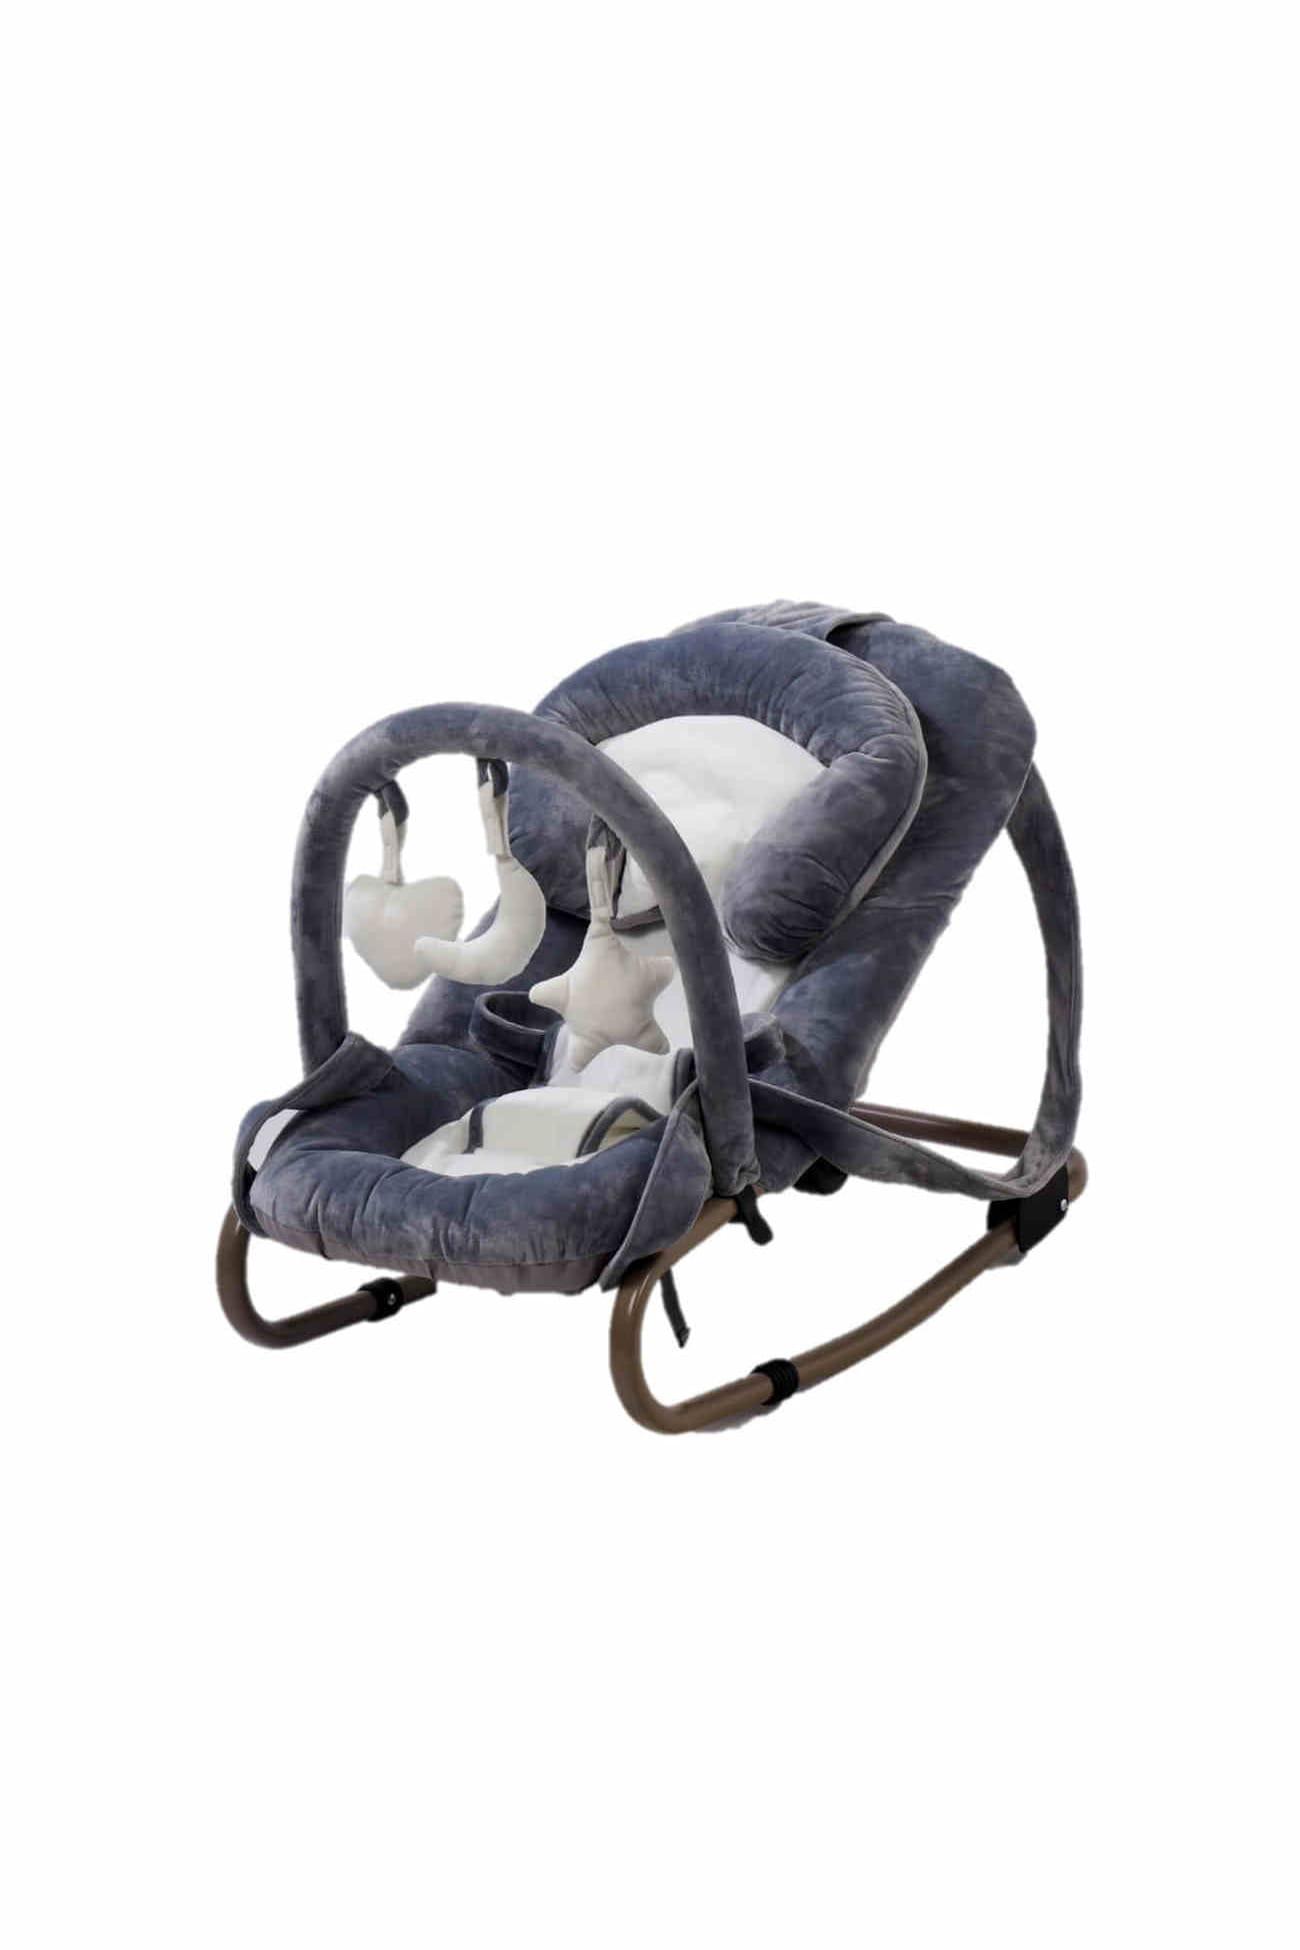 Transat Bébé Babyrocker Comptine Dauchan